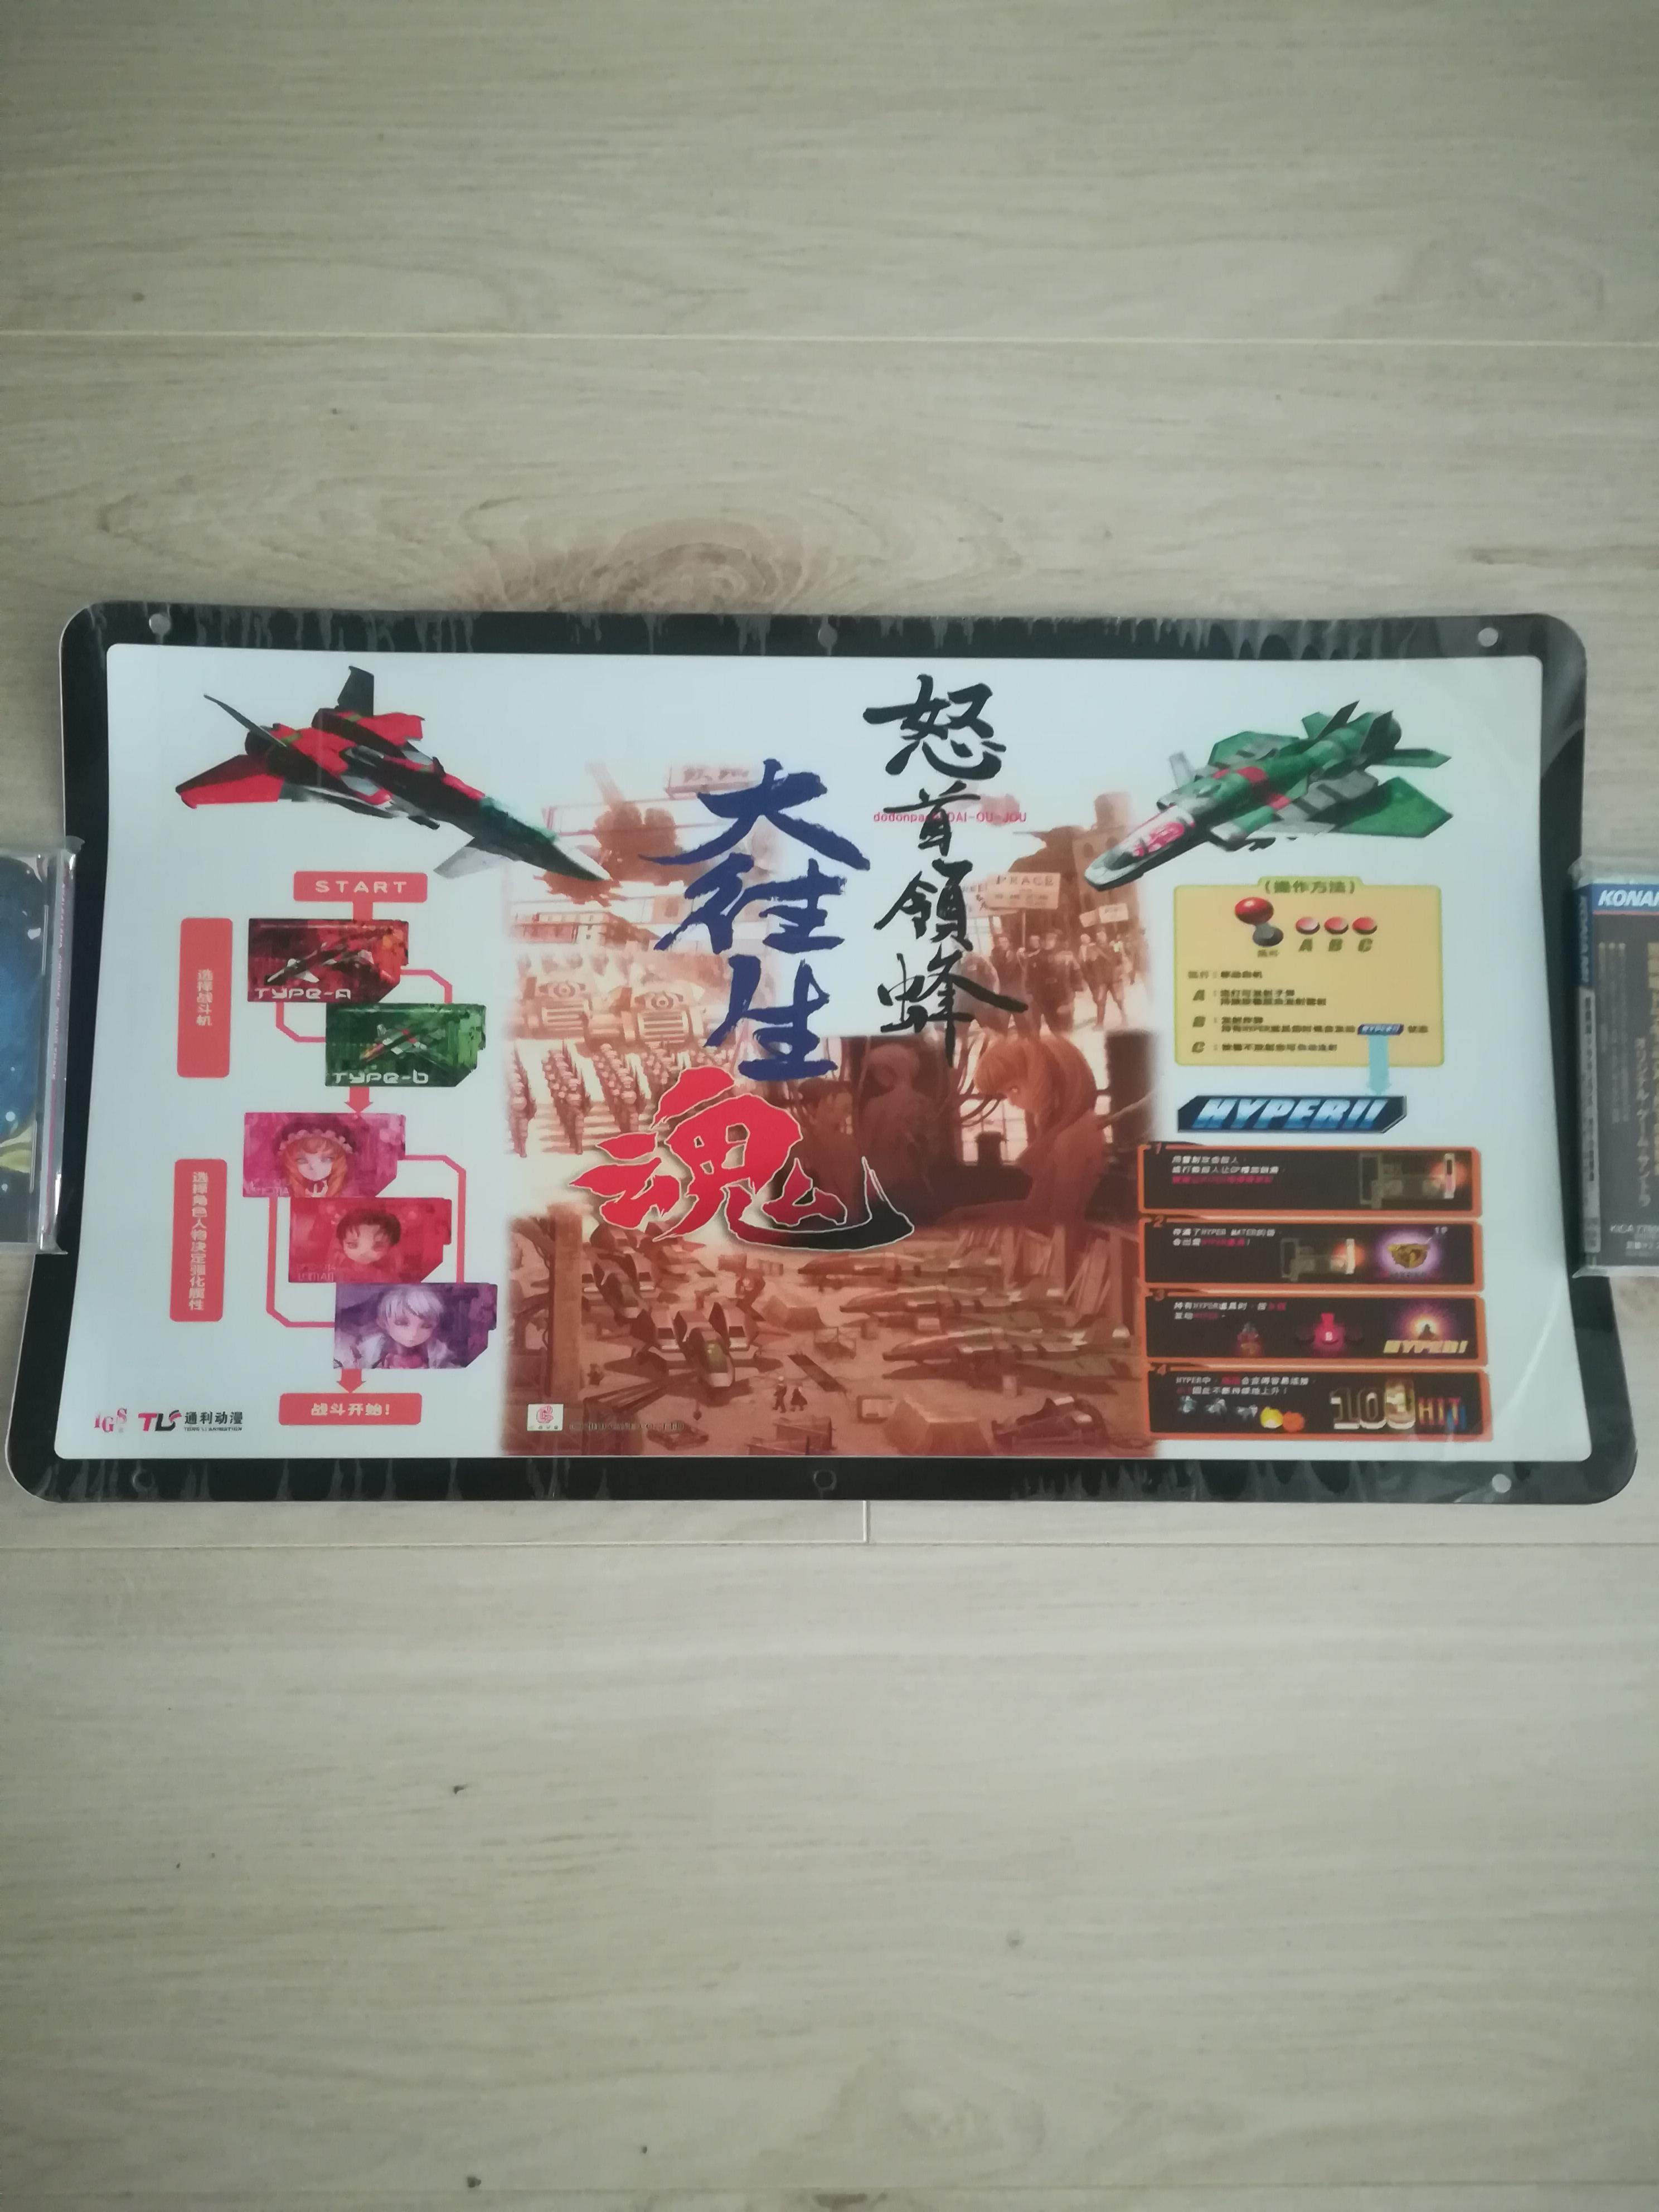 [Dossier] shmups full kits CAVE / Computer Art Visual Entertainment  1540135450-img-20180616-140445